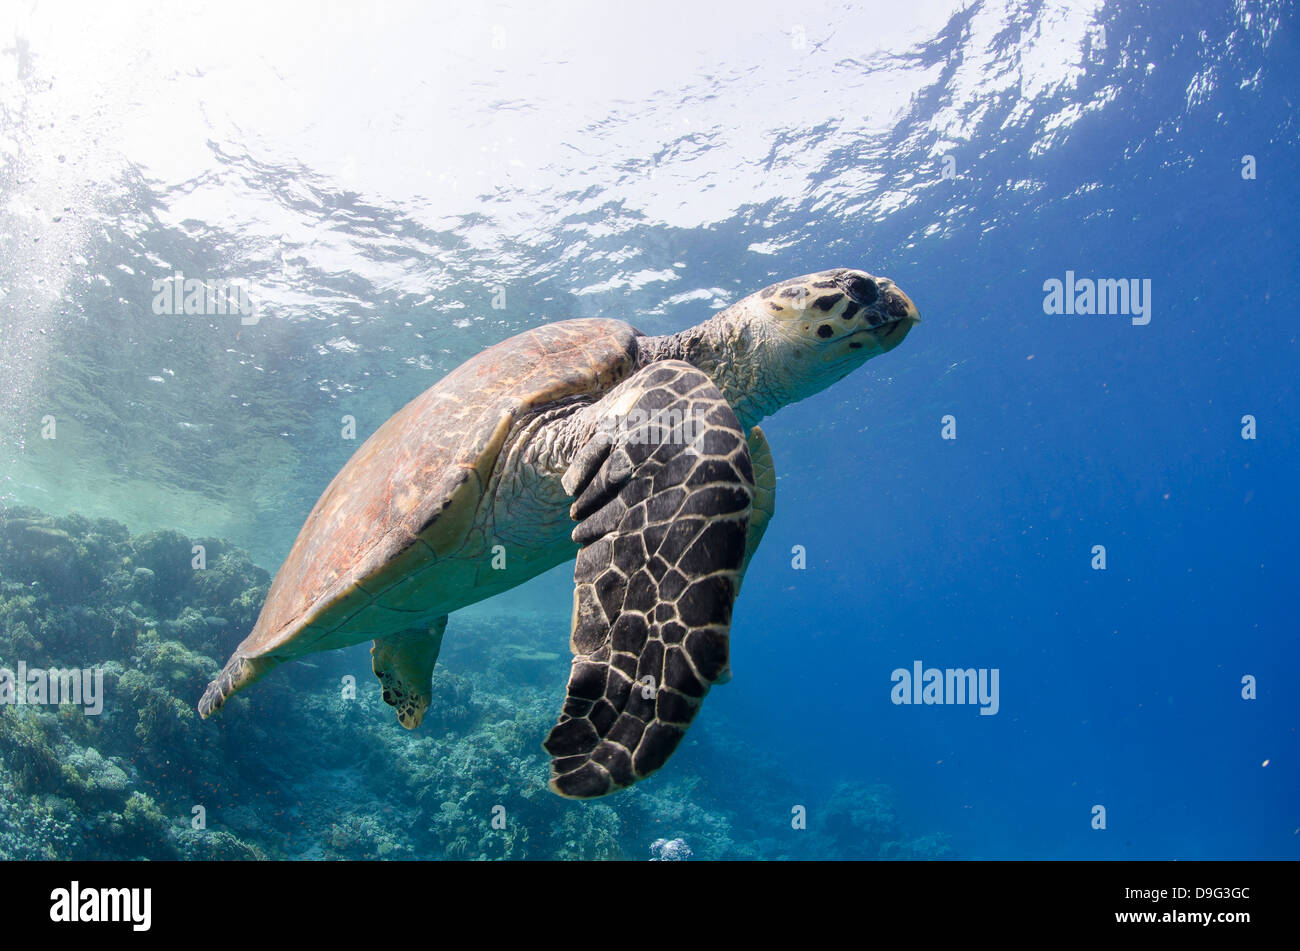 The critically endangered hawksbill turtle (Eretmochelys imbricata), Ras Mohammed National Park, Sinai, Red Sea, - Stock Image